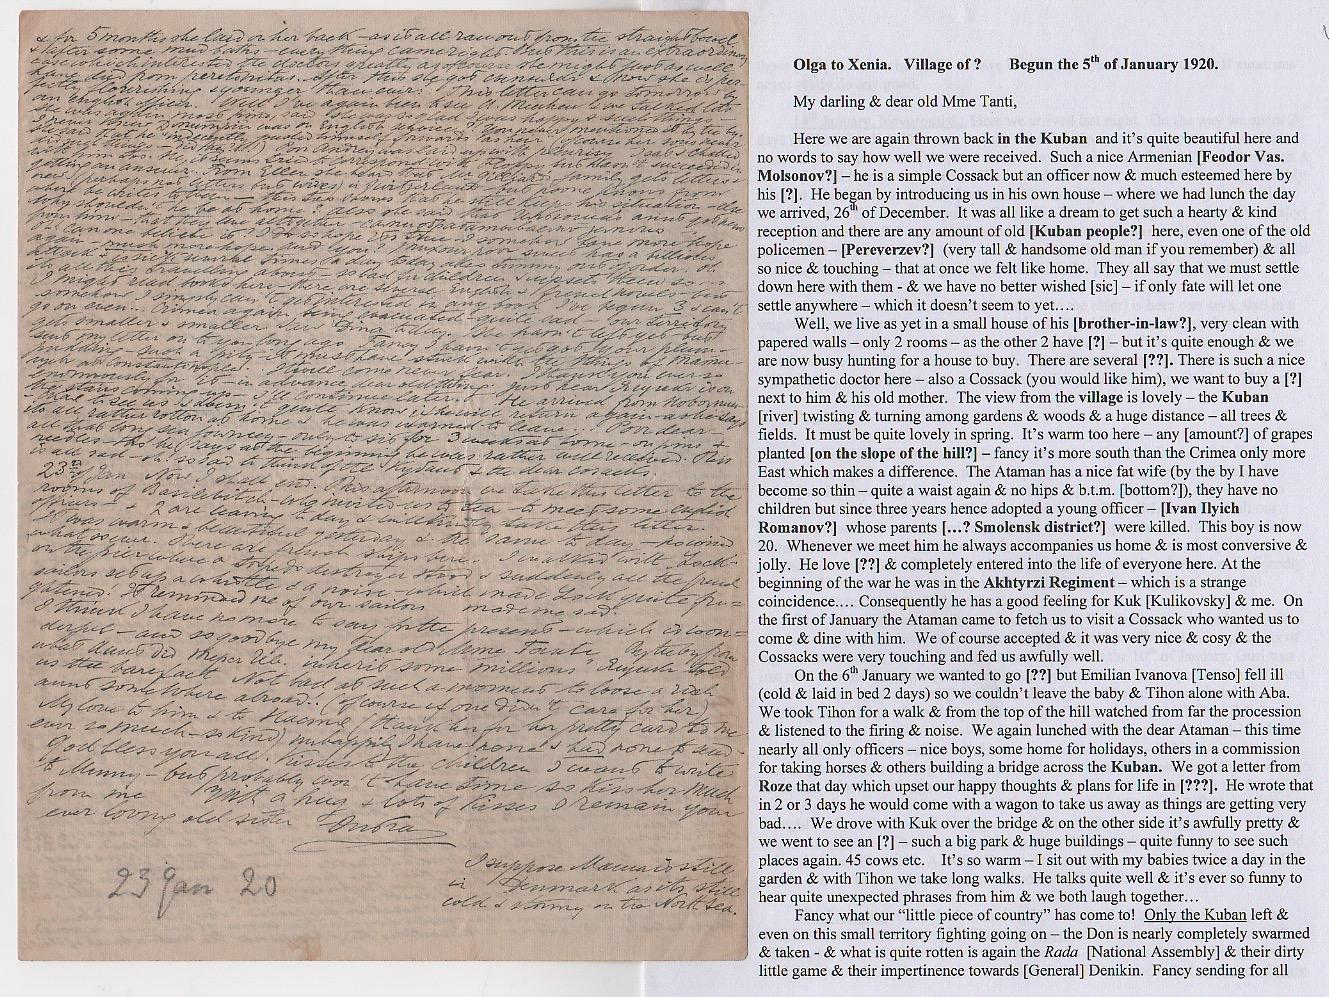 Royalty Grand Duchess Olga Correspondence To Her Sister Grand Duchess Xenia 1916-1920 - Image 8 of 47